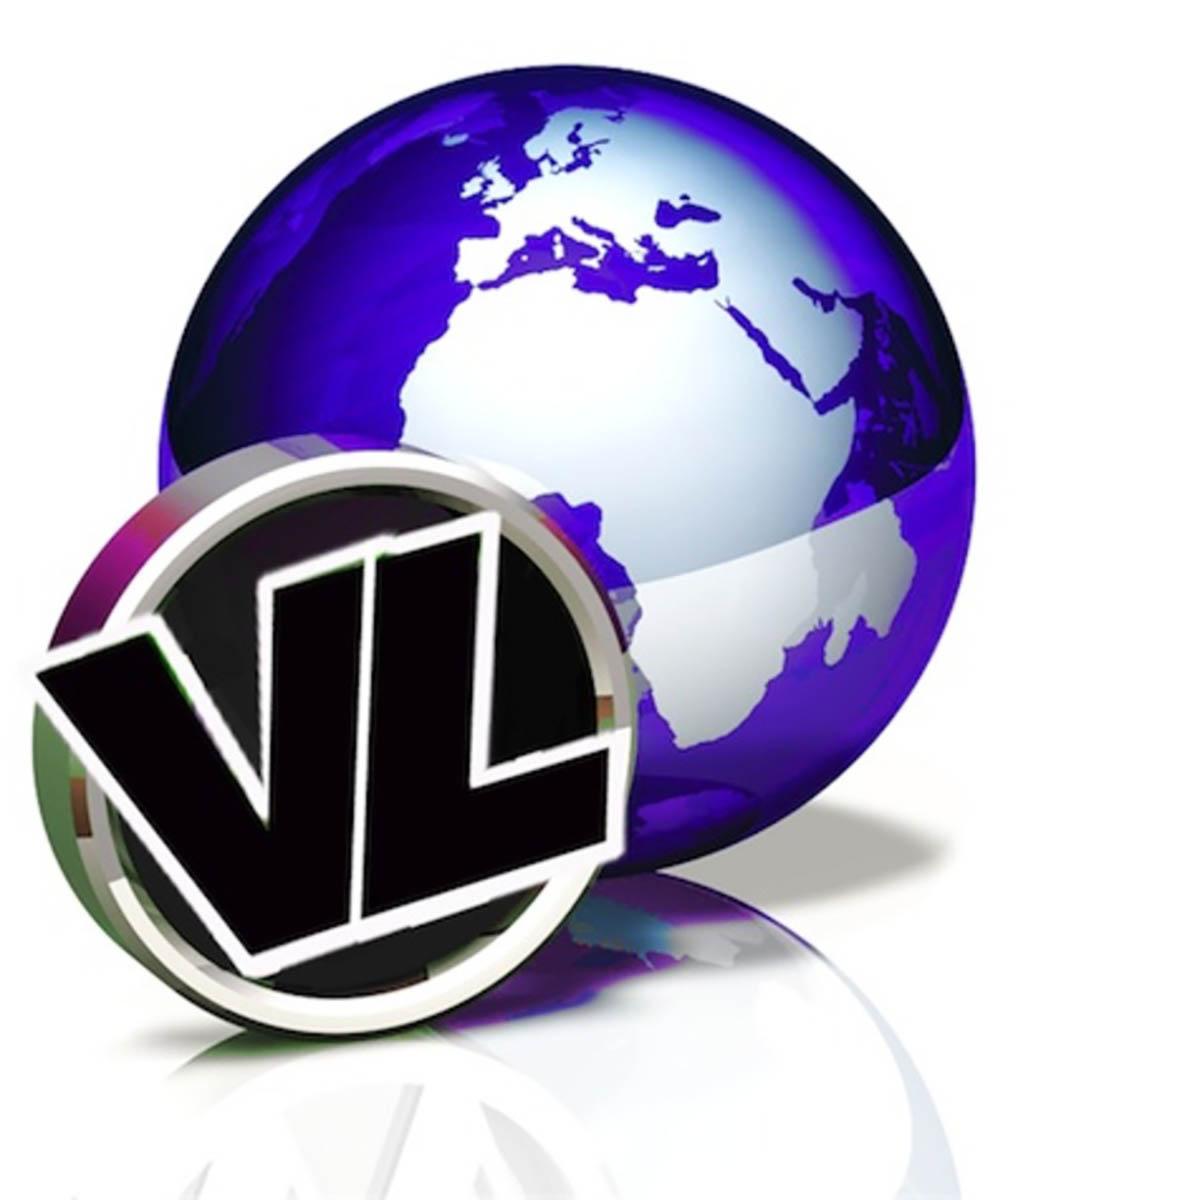 M.I.A., Vicki Leekx